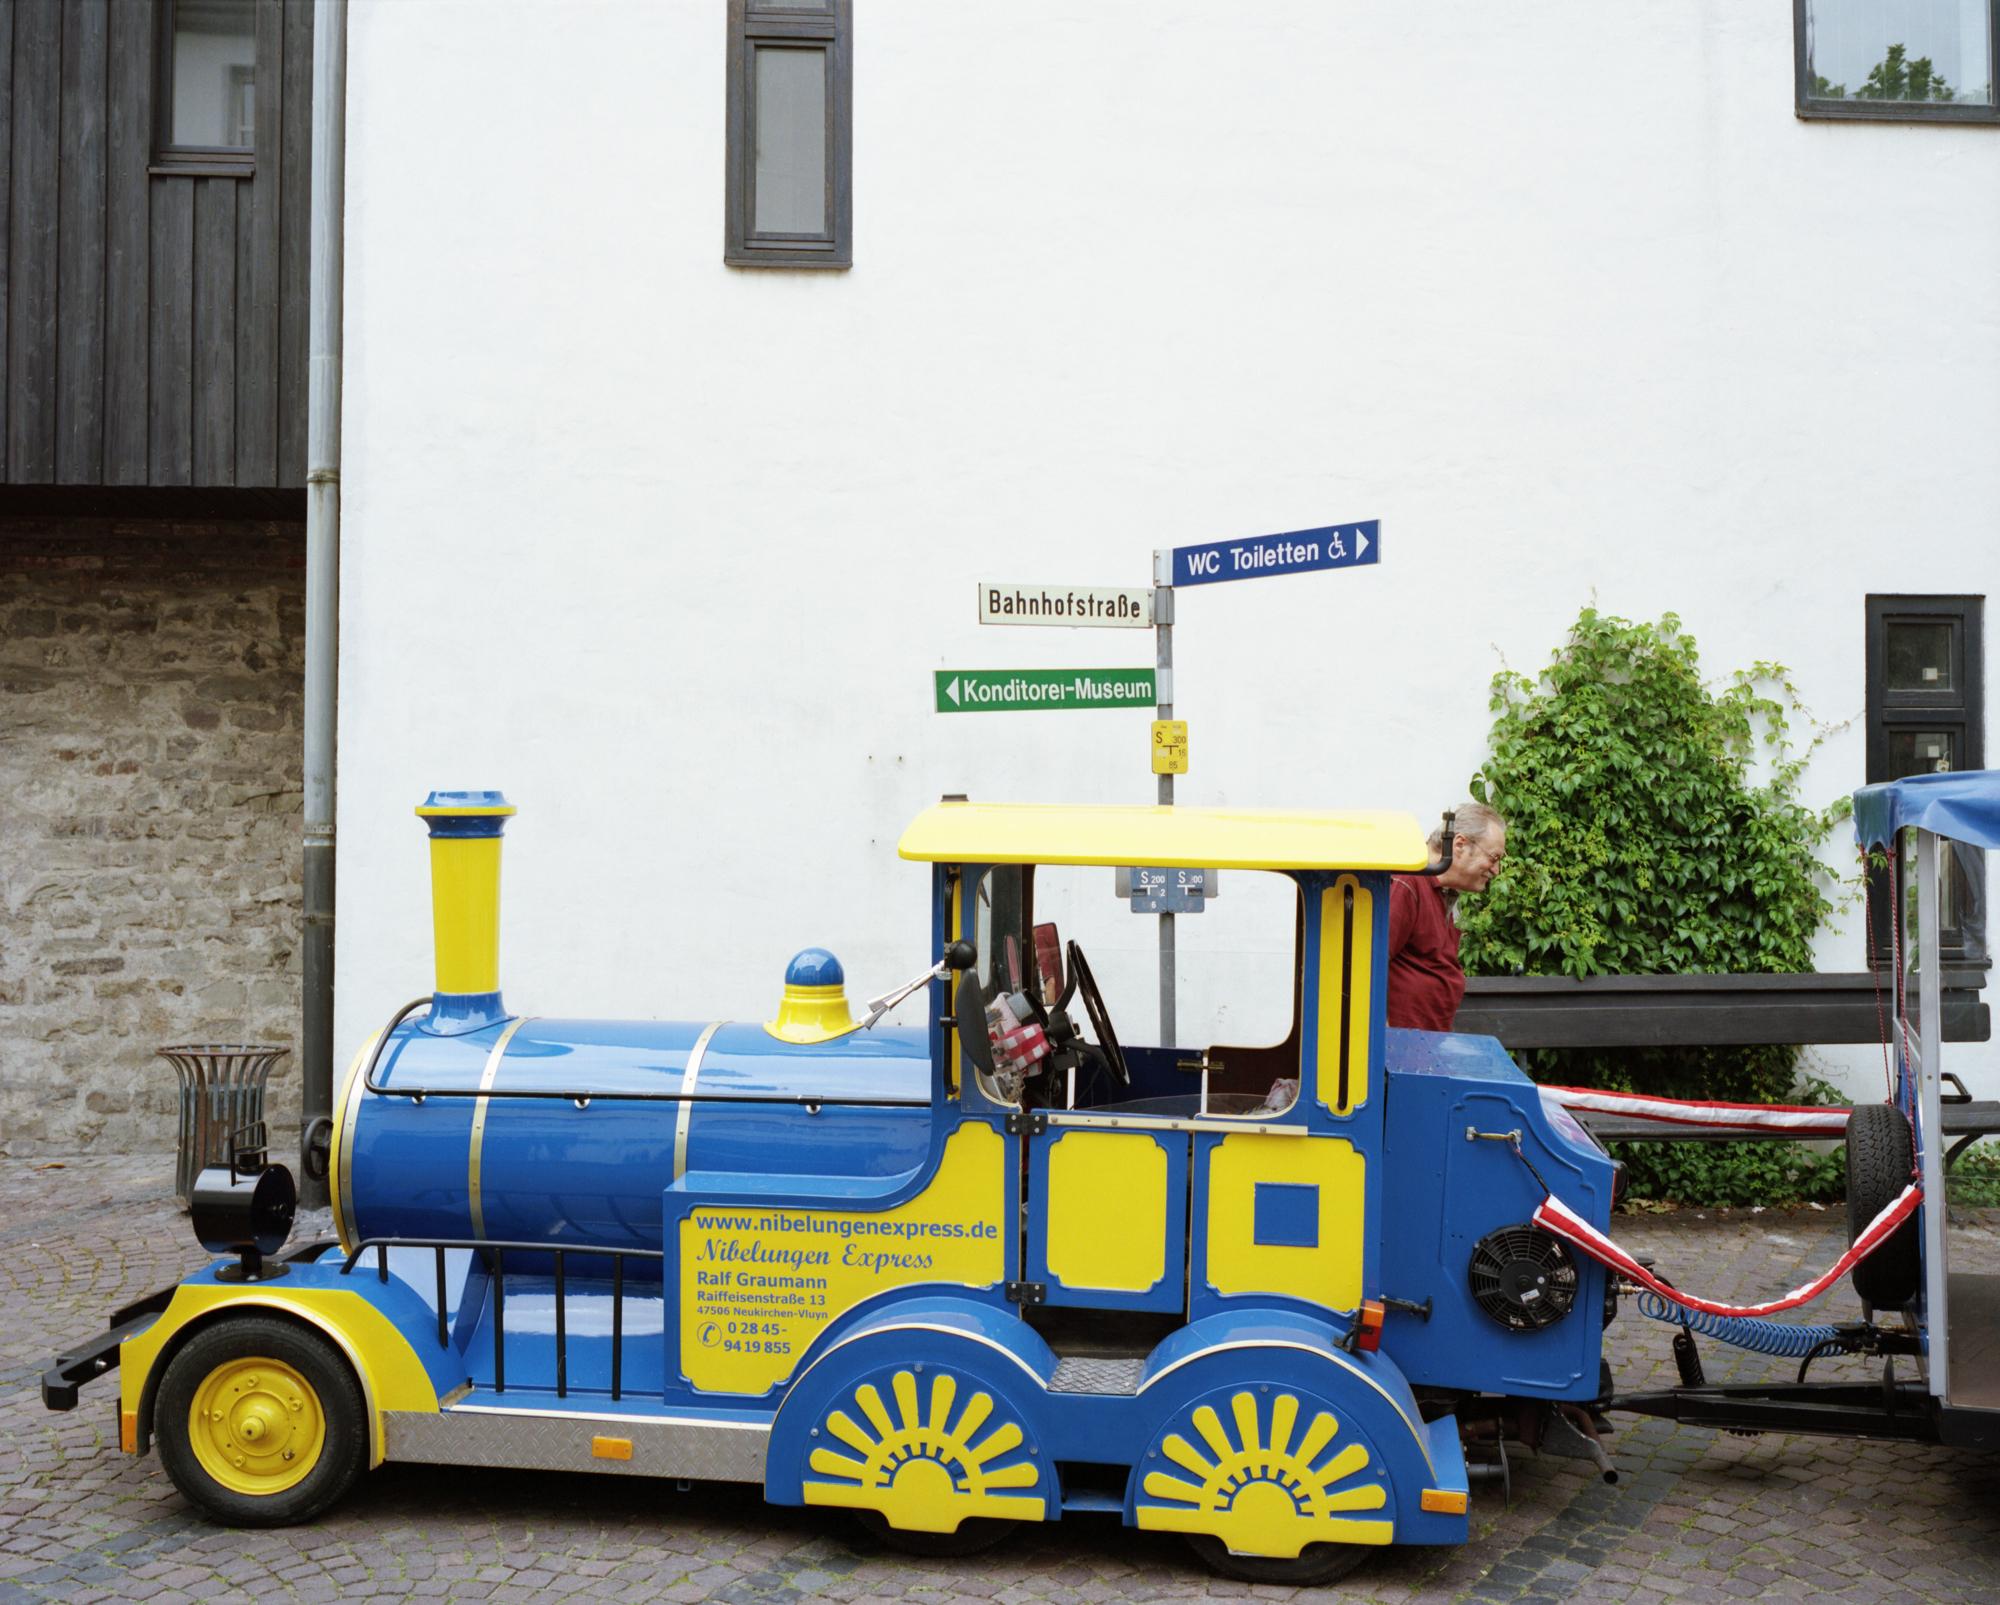 Xantan, Germany